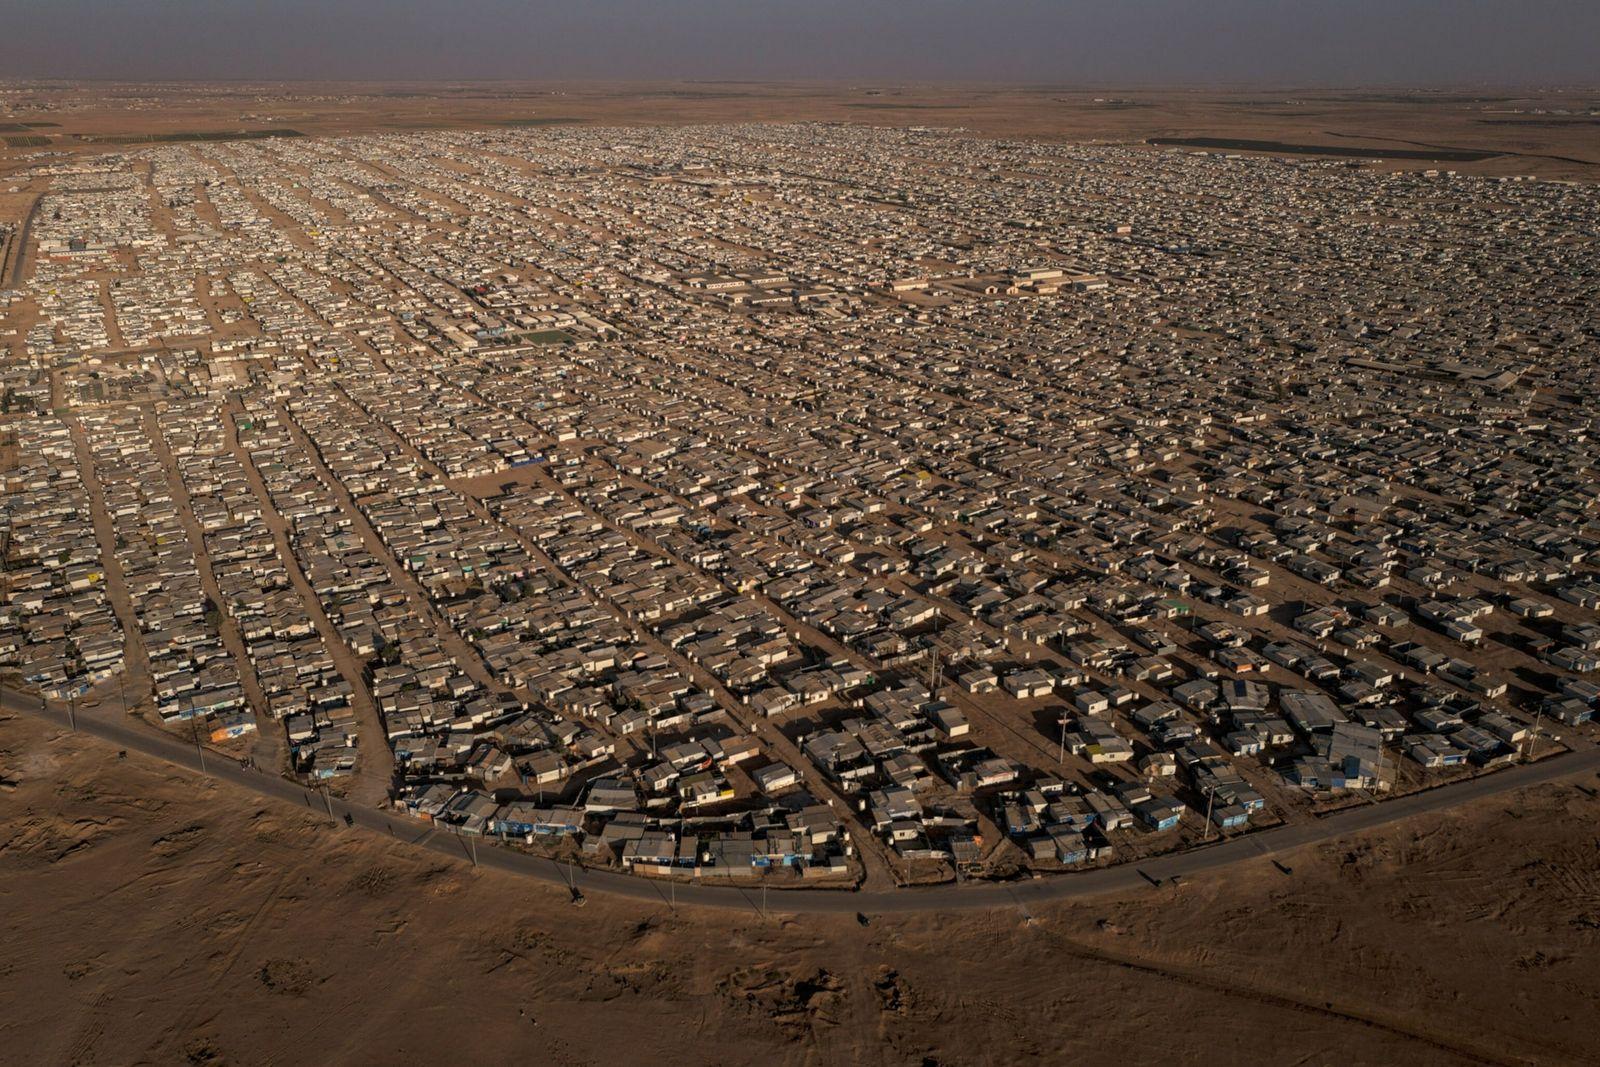 campo de refugiados de Zaatari - vista aérea